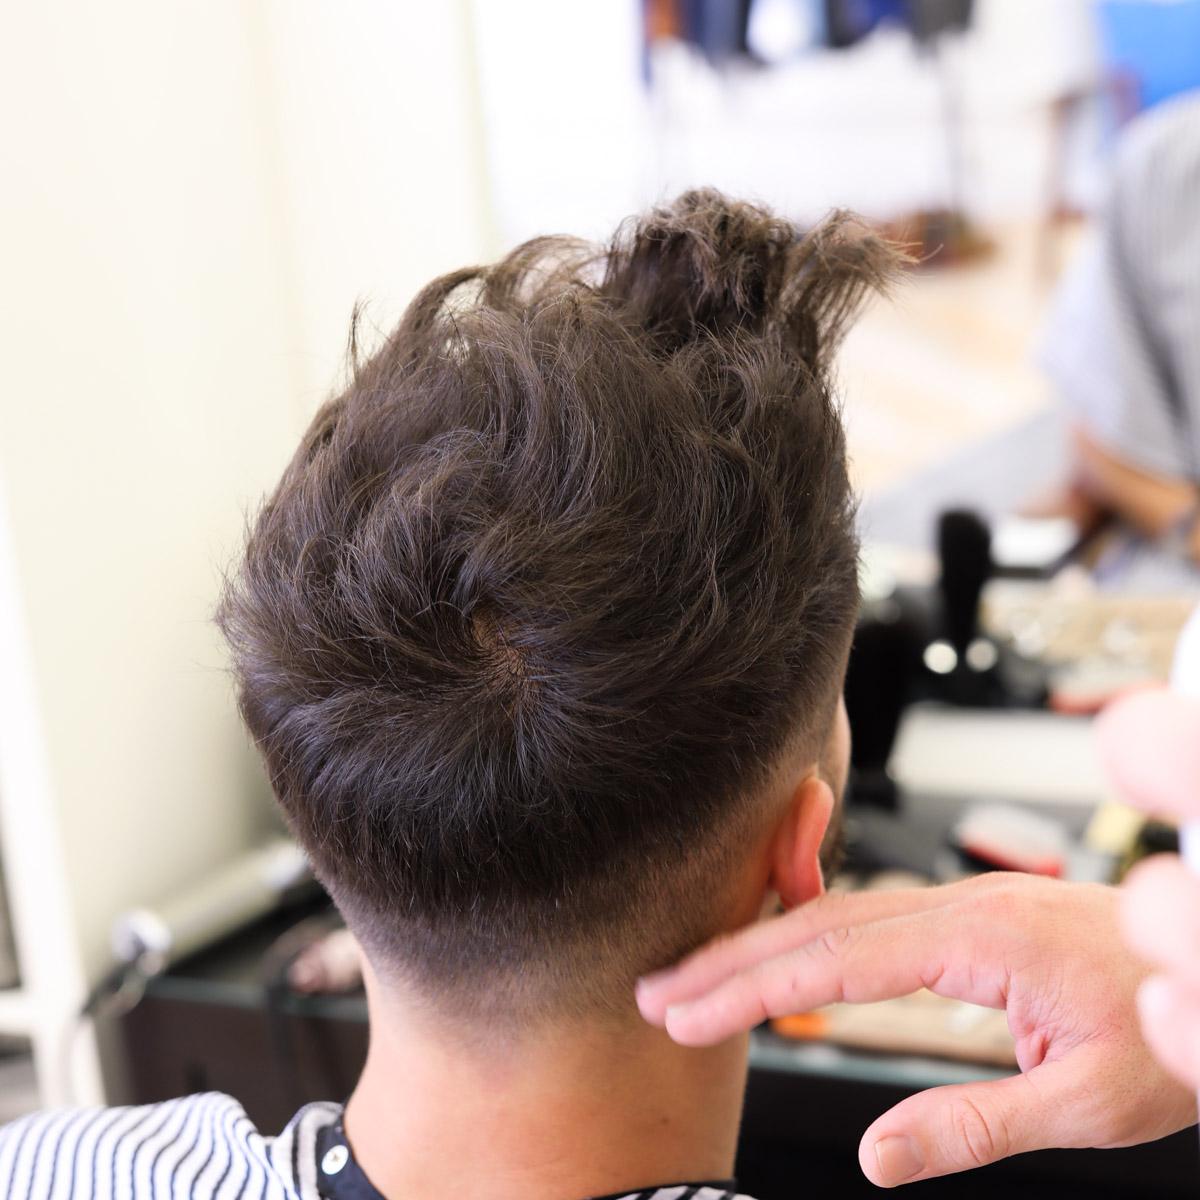 nioxin-hair-style-grooming-man-for-himself